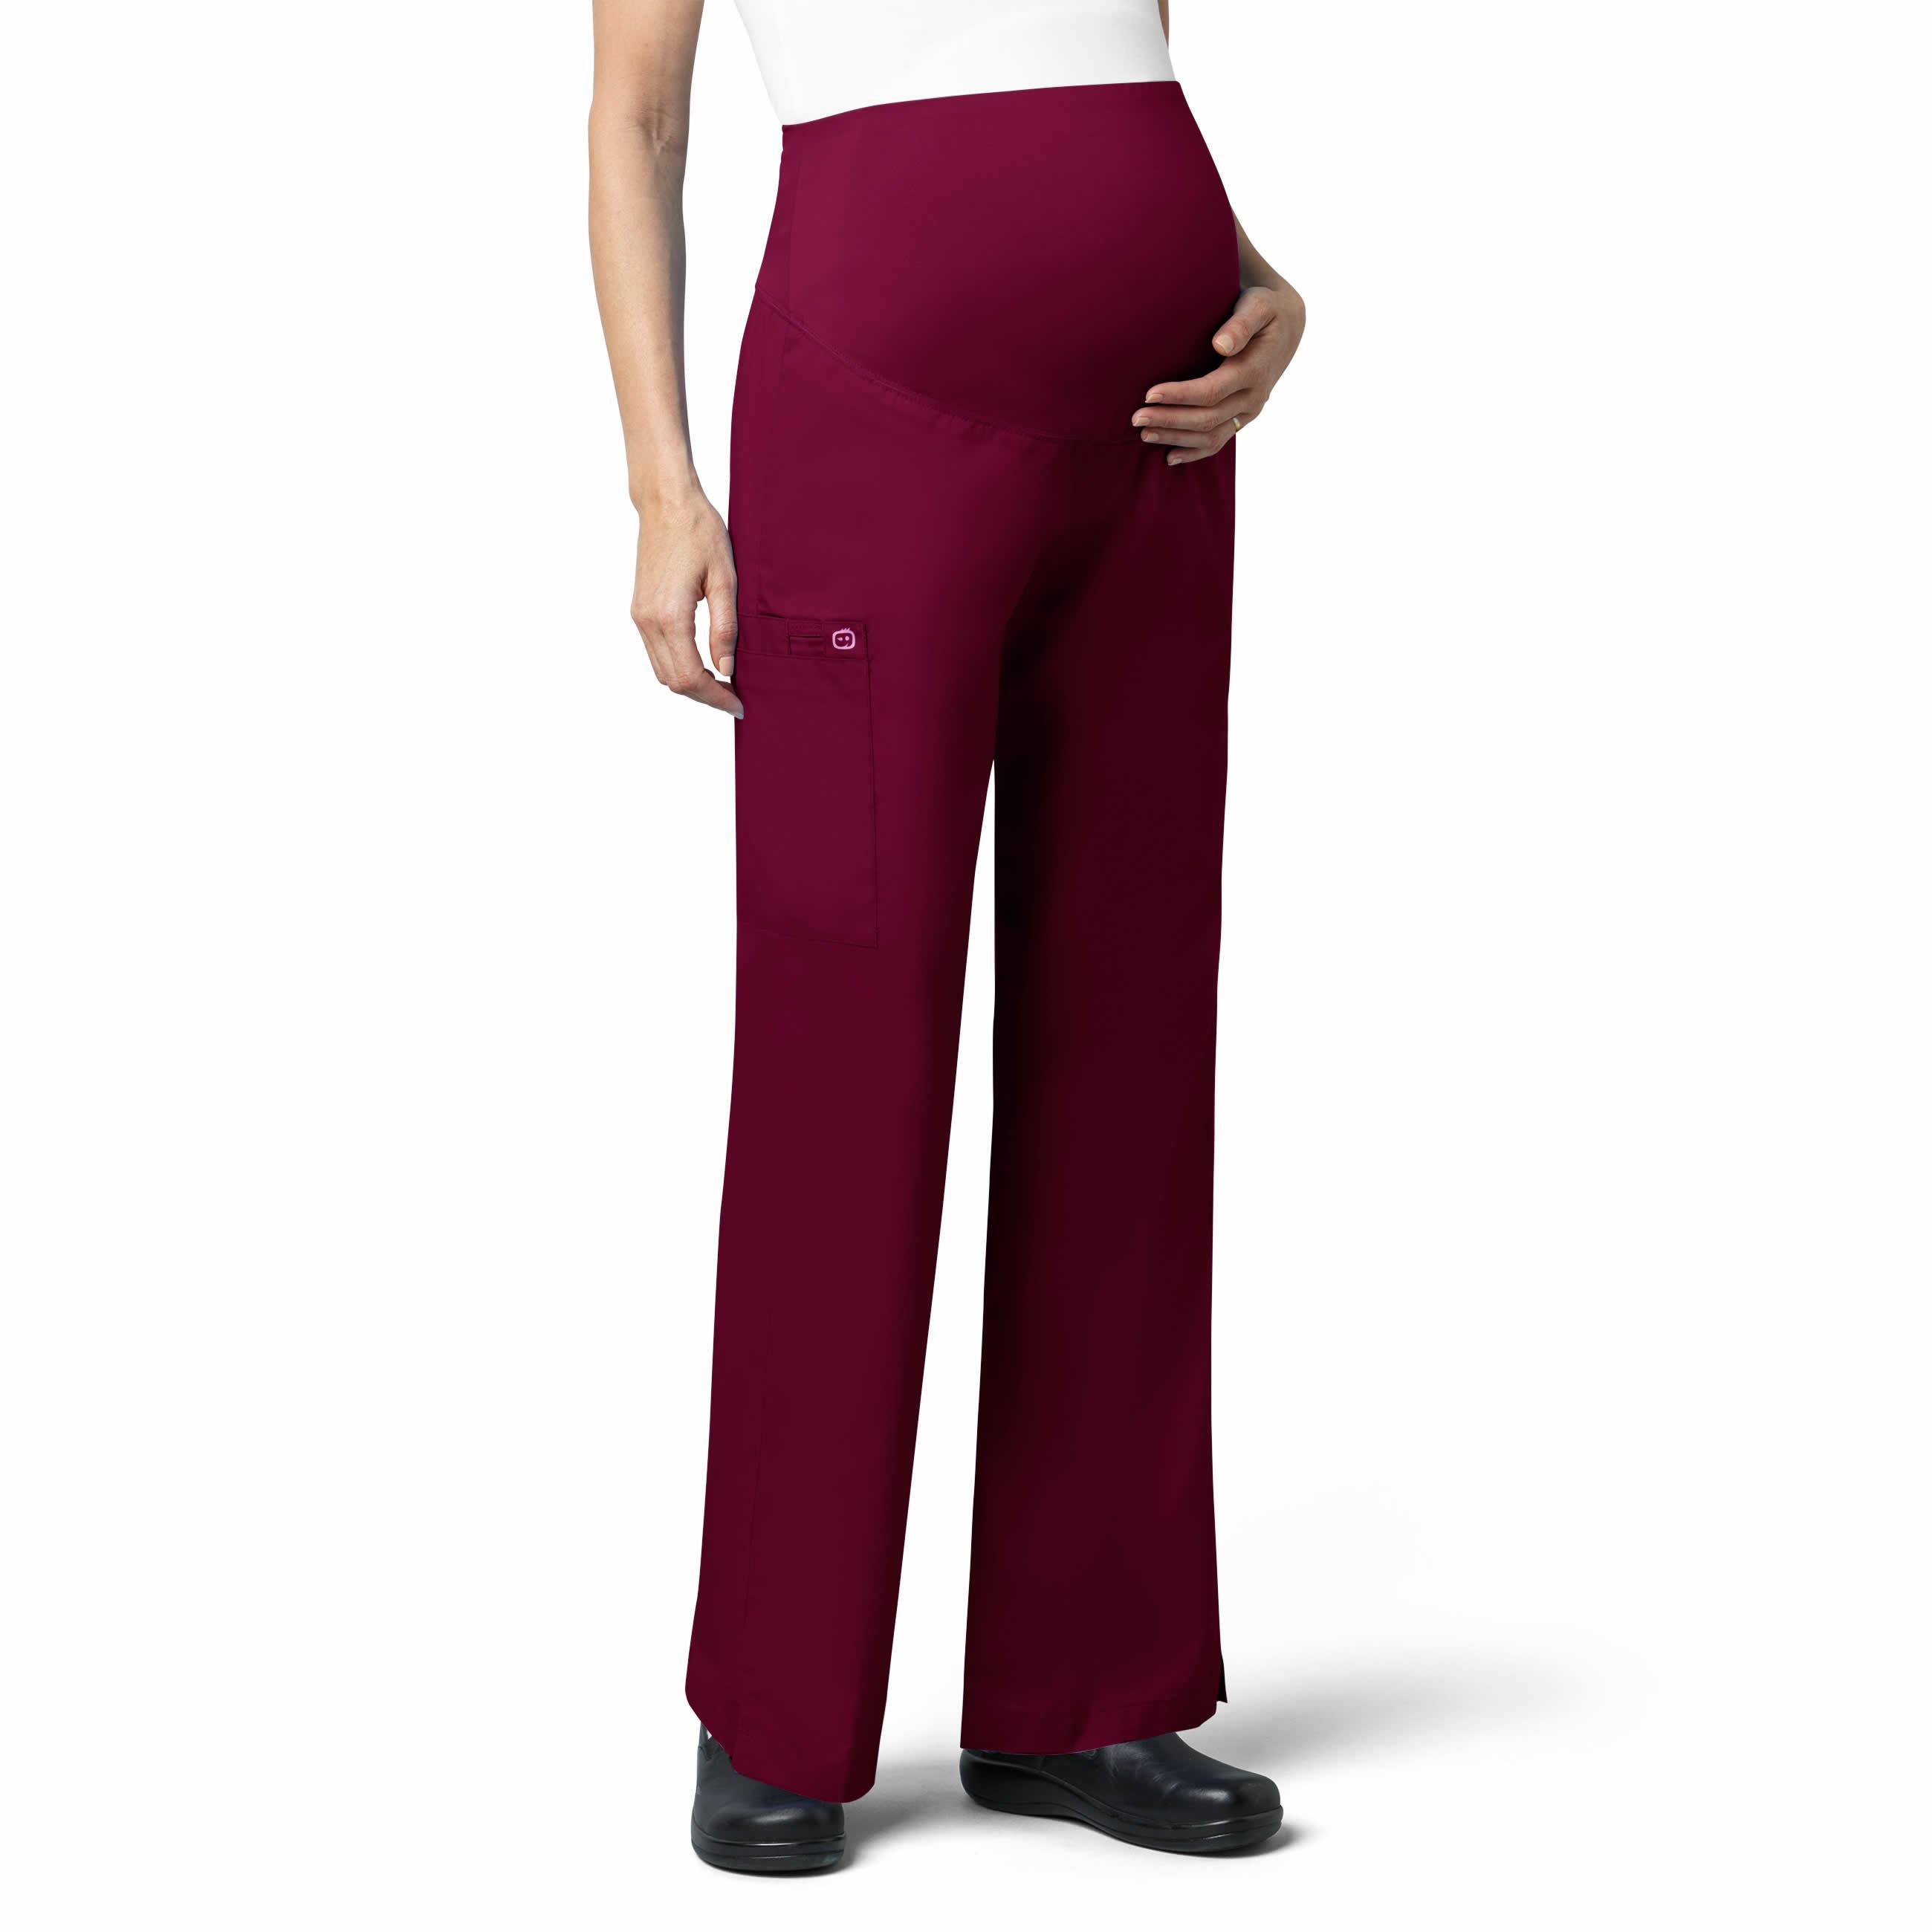 WonderWork Women's Maternity Cargo Pant - 545